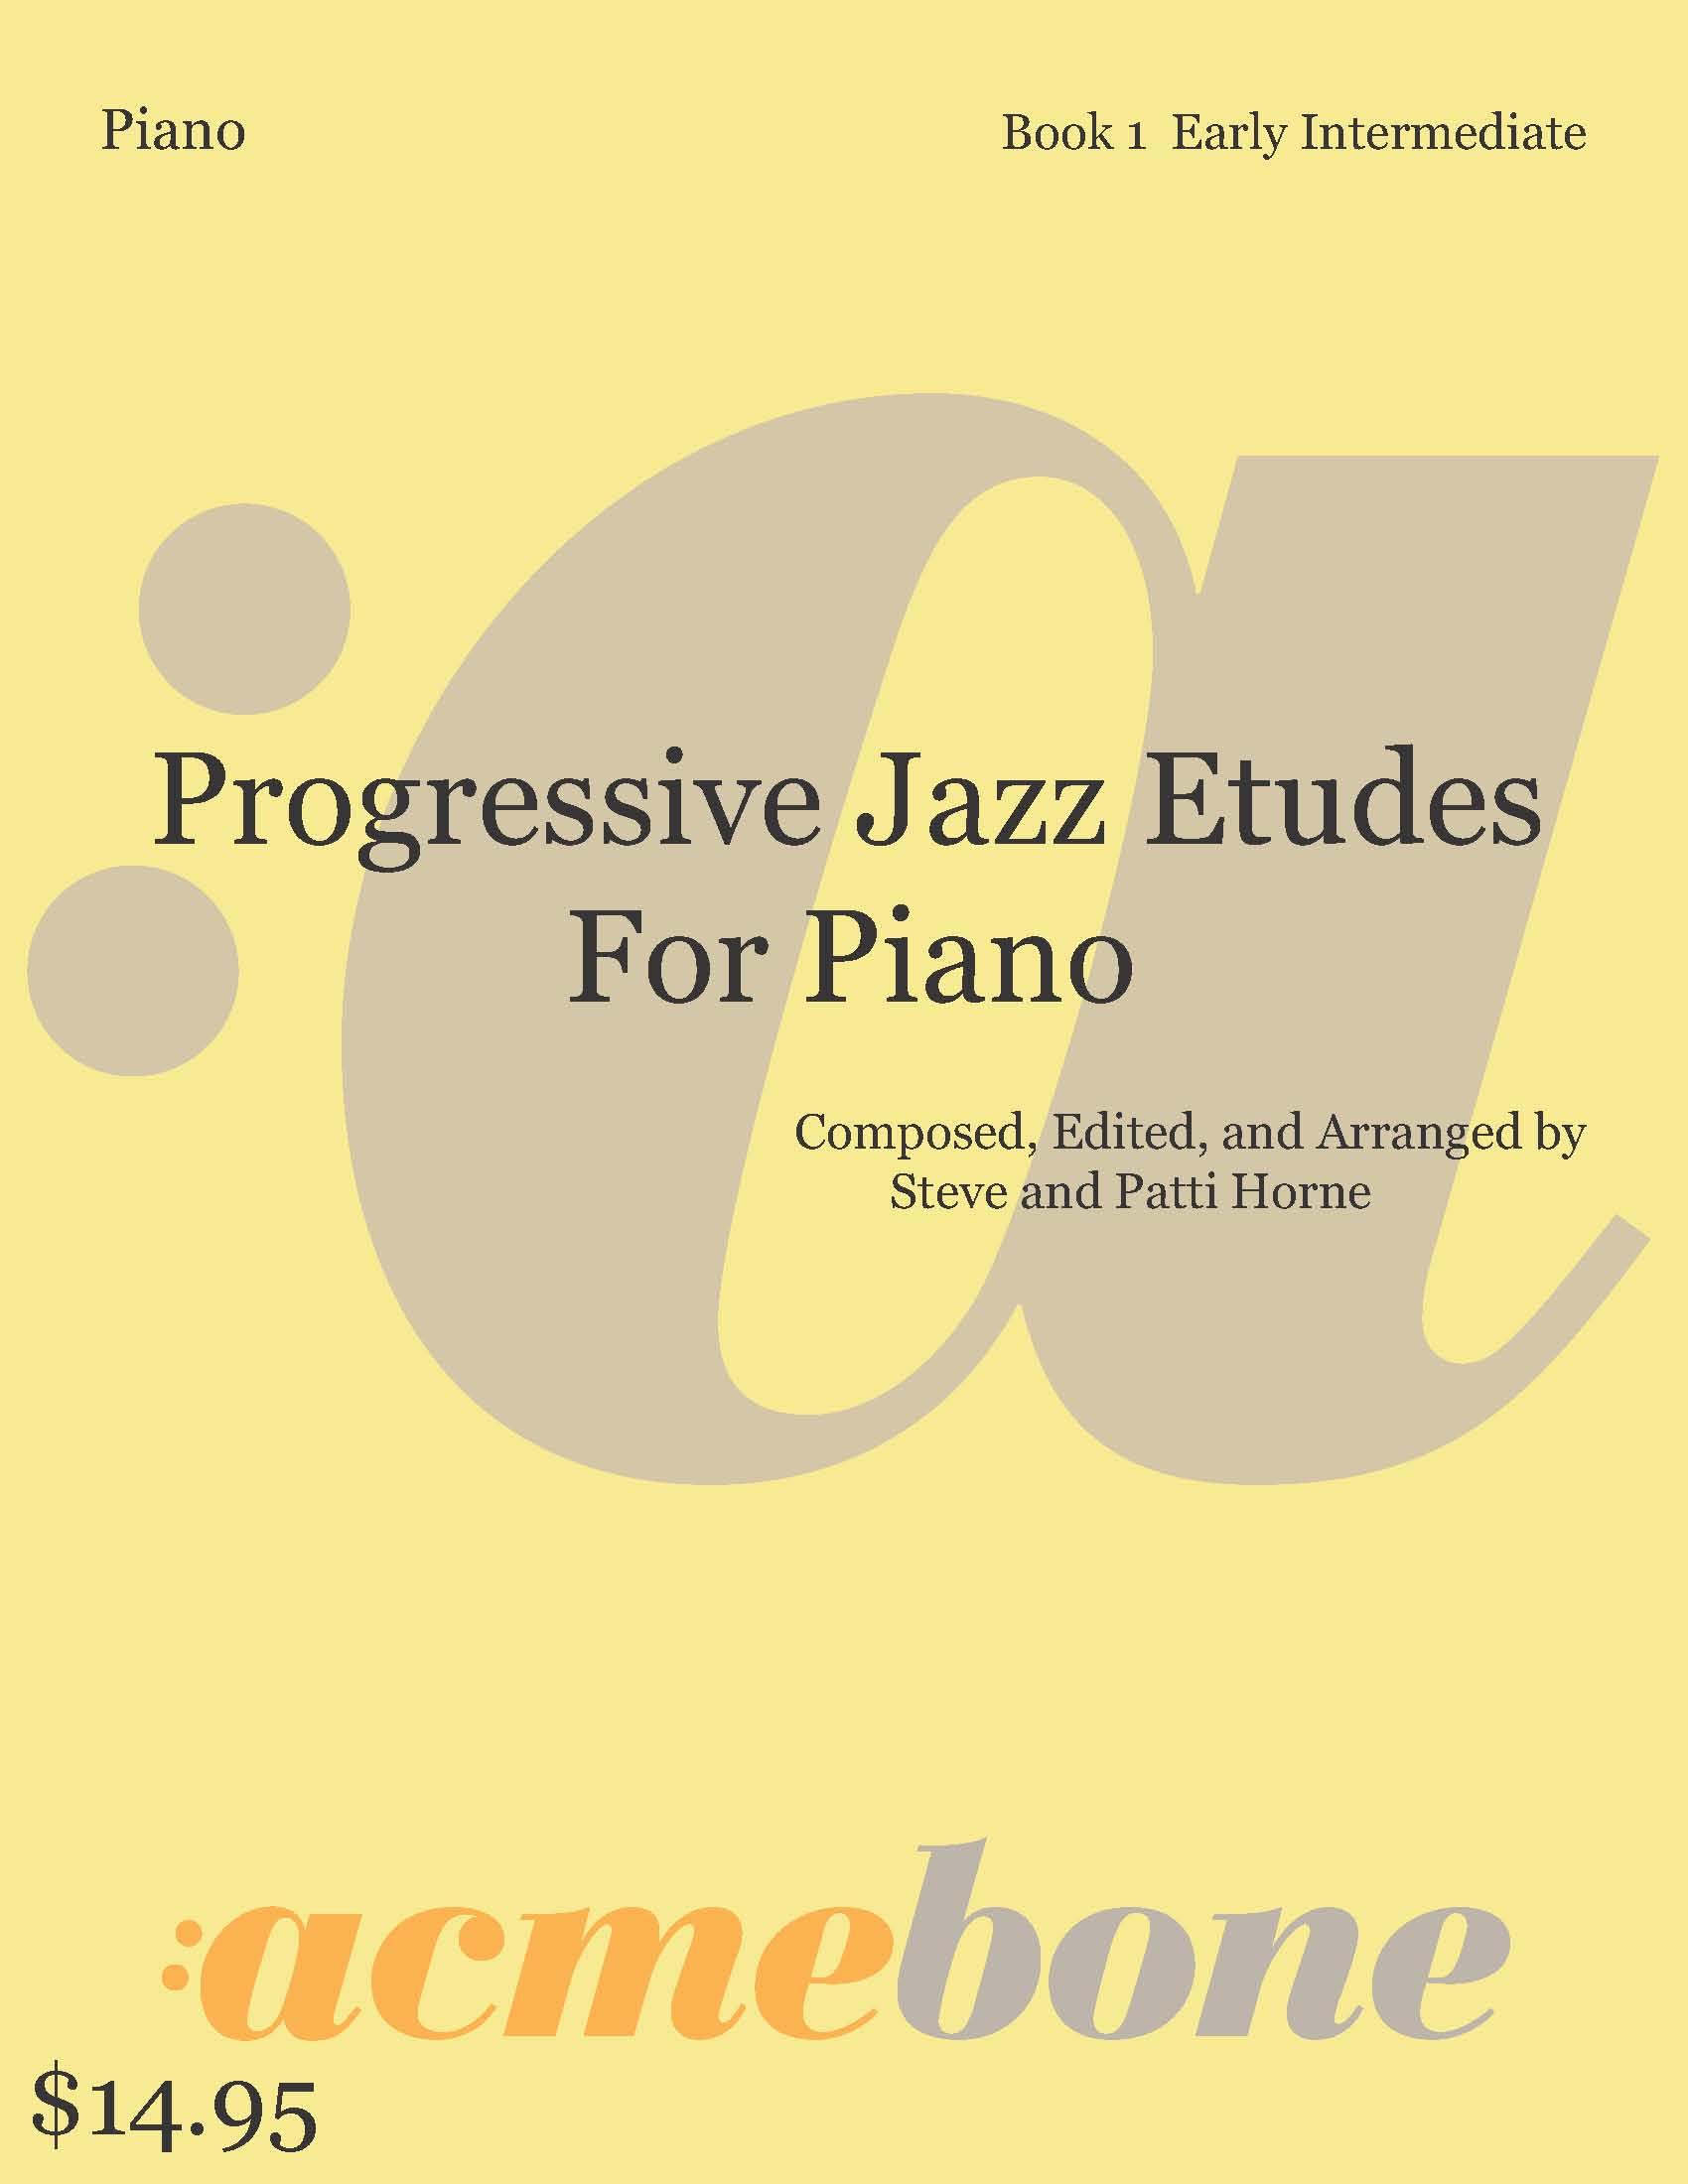 Piano Etudes_cover_book1_price.jpg